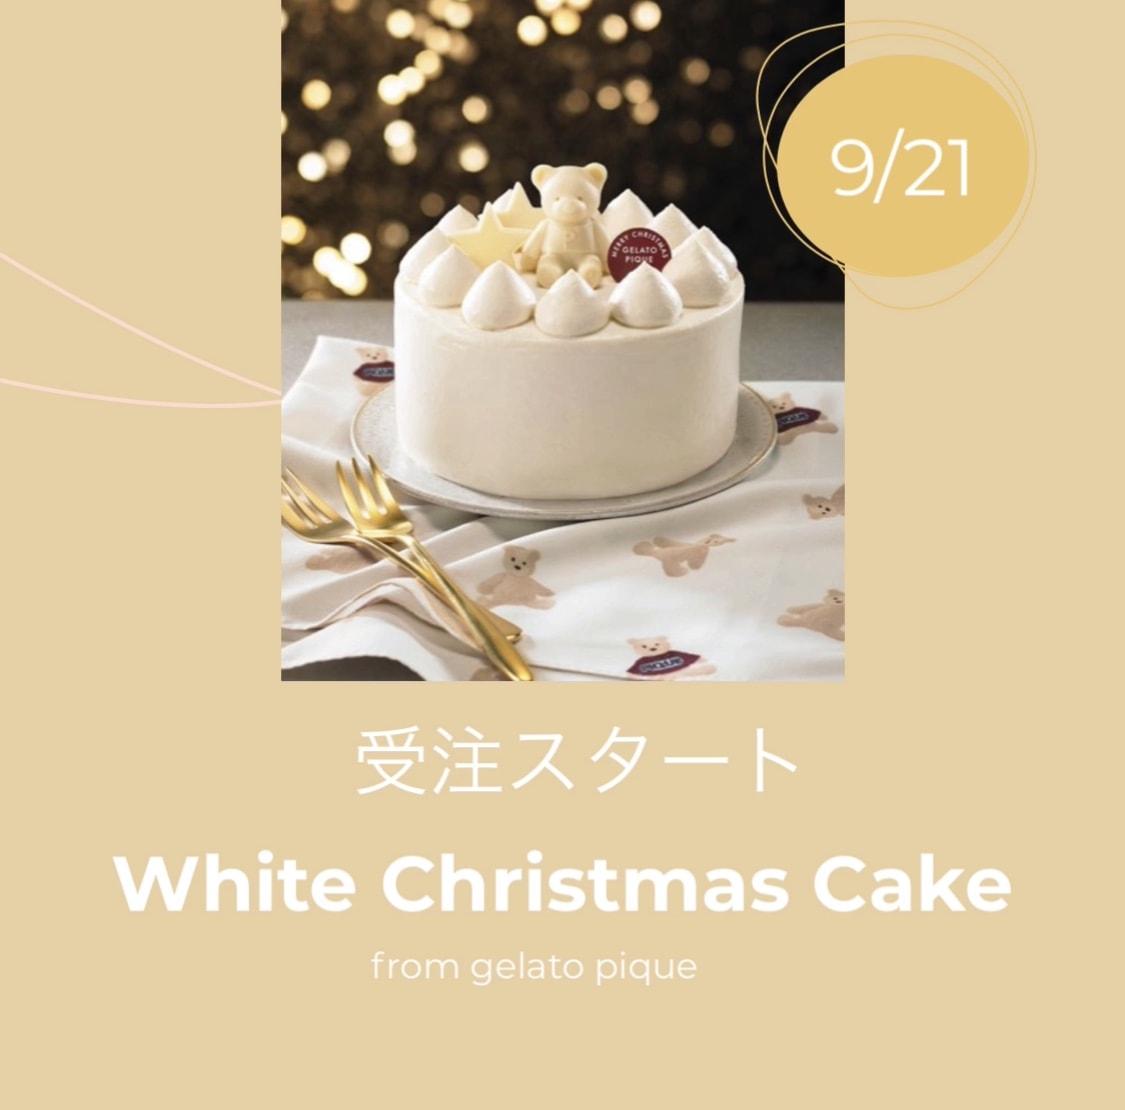 gelato pique White Christmas Cake -img